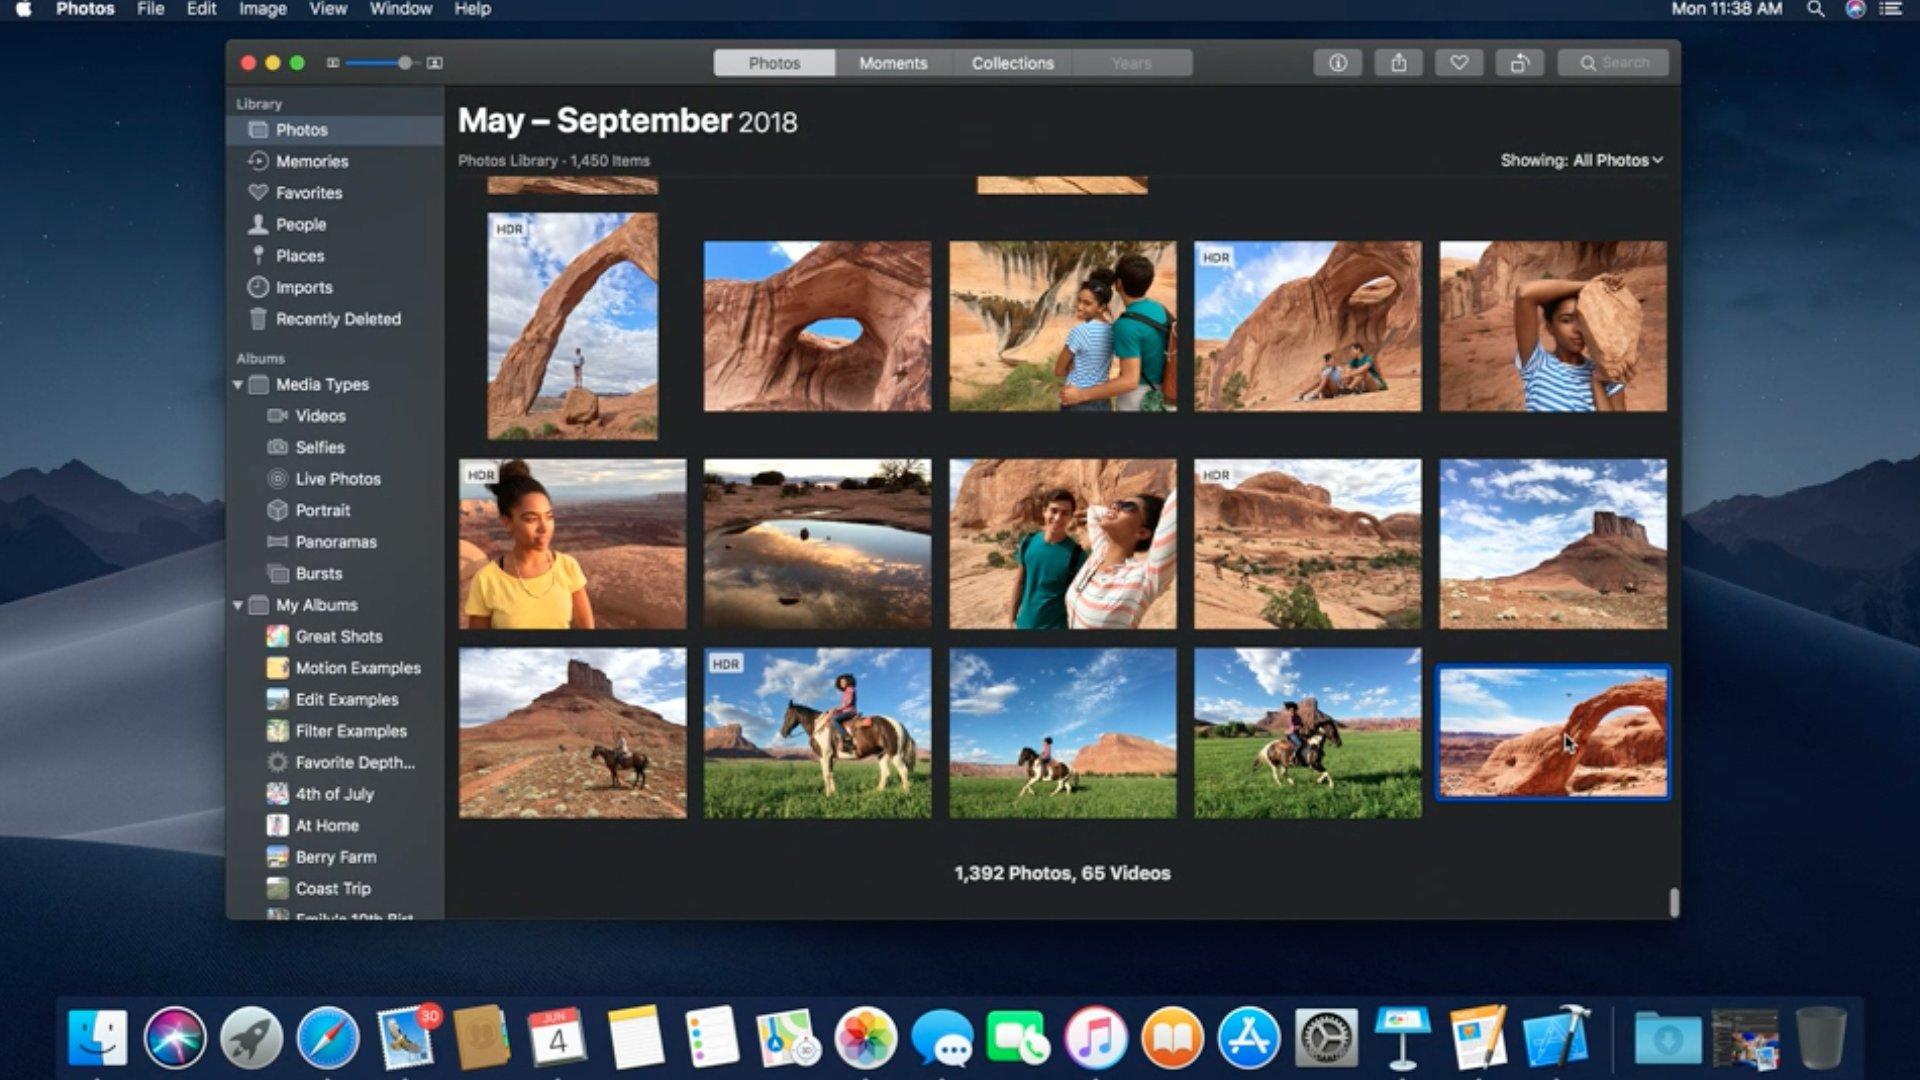 macOS 10.14 Mojave: Dark Mode